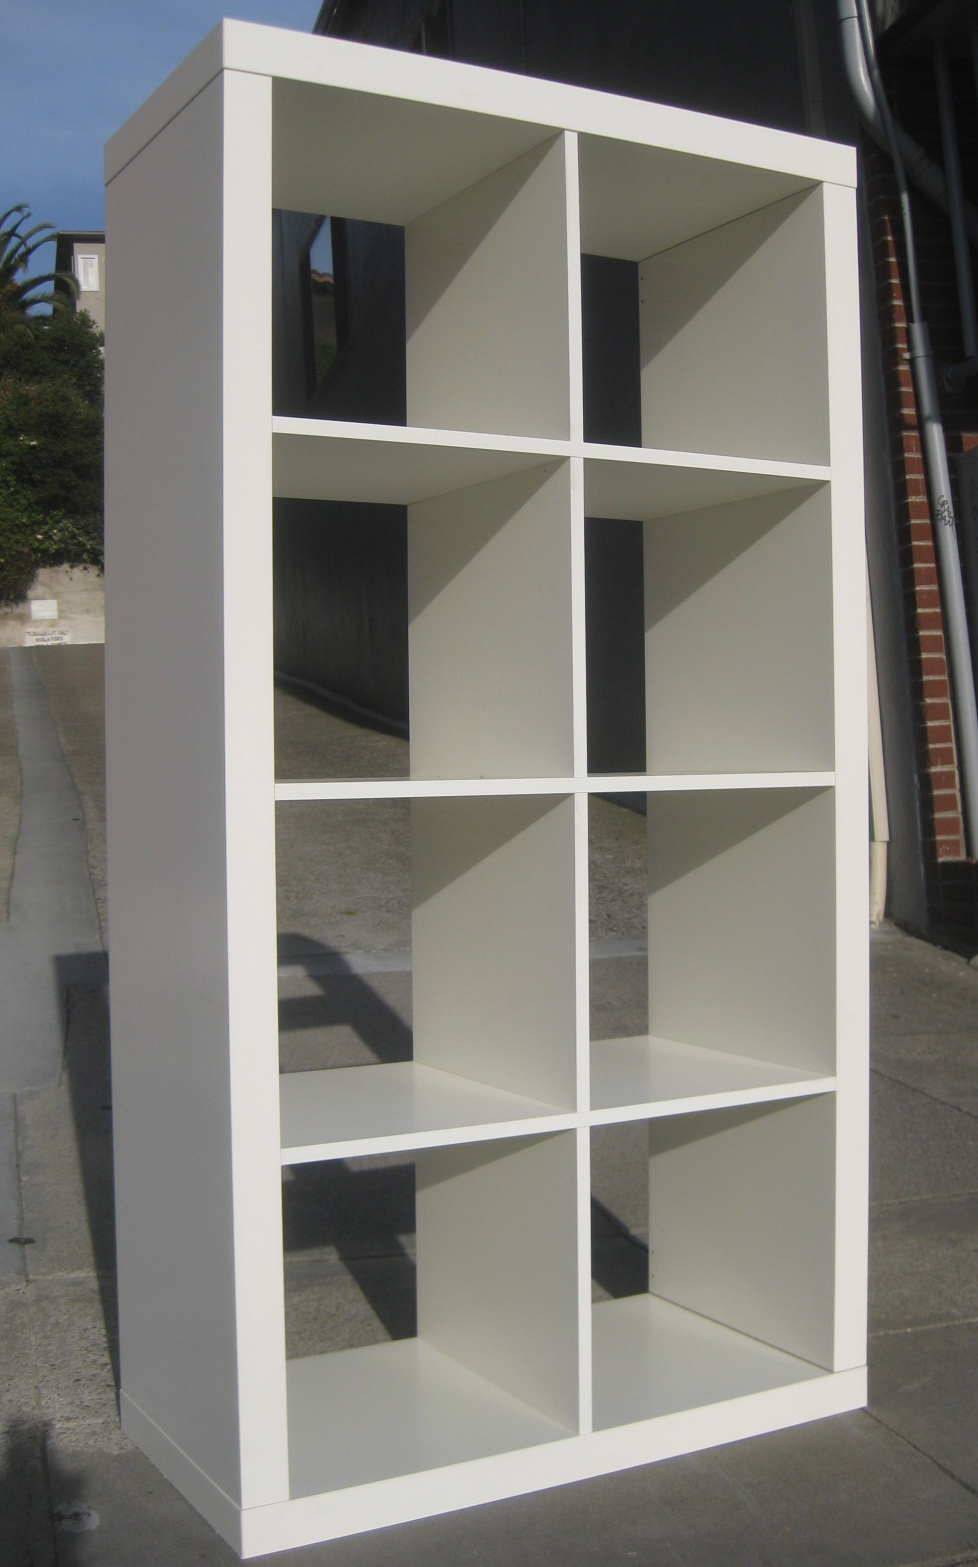 Sold Ikea Cube Shelf 45